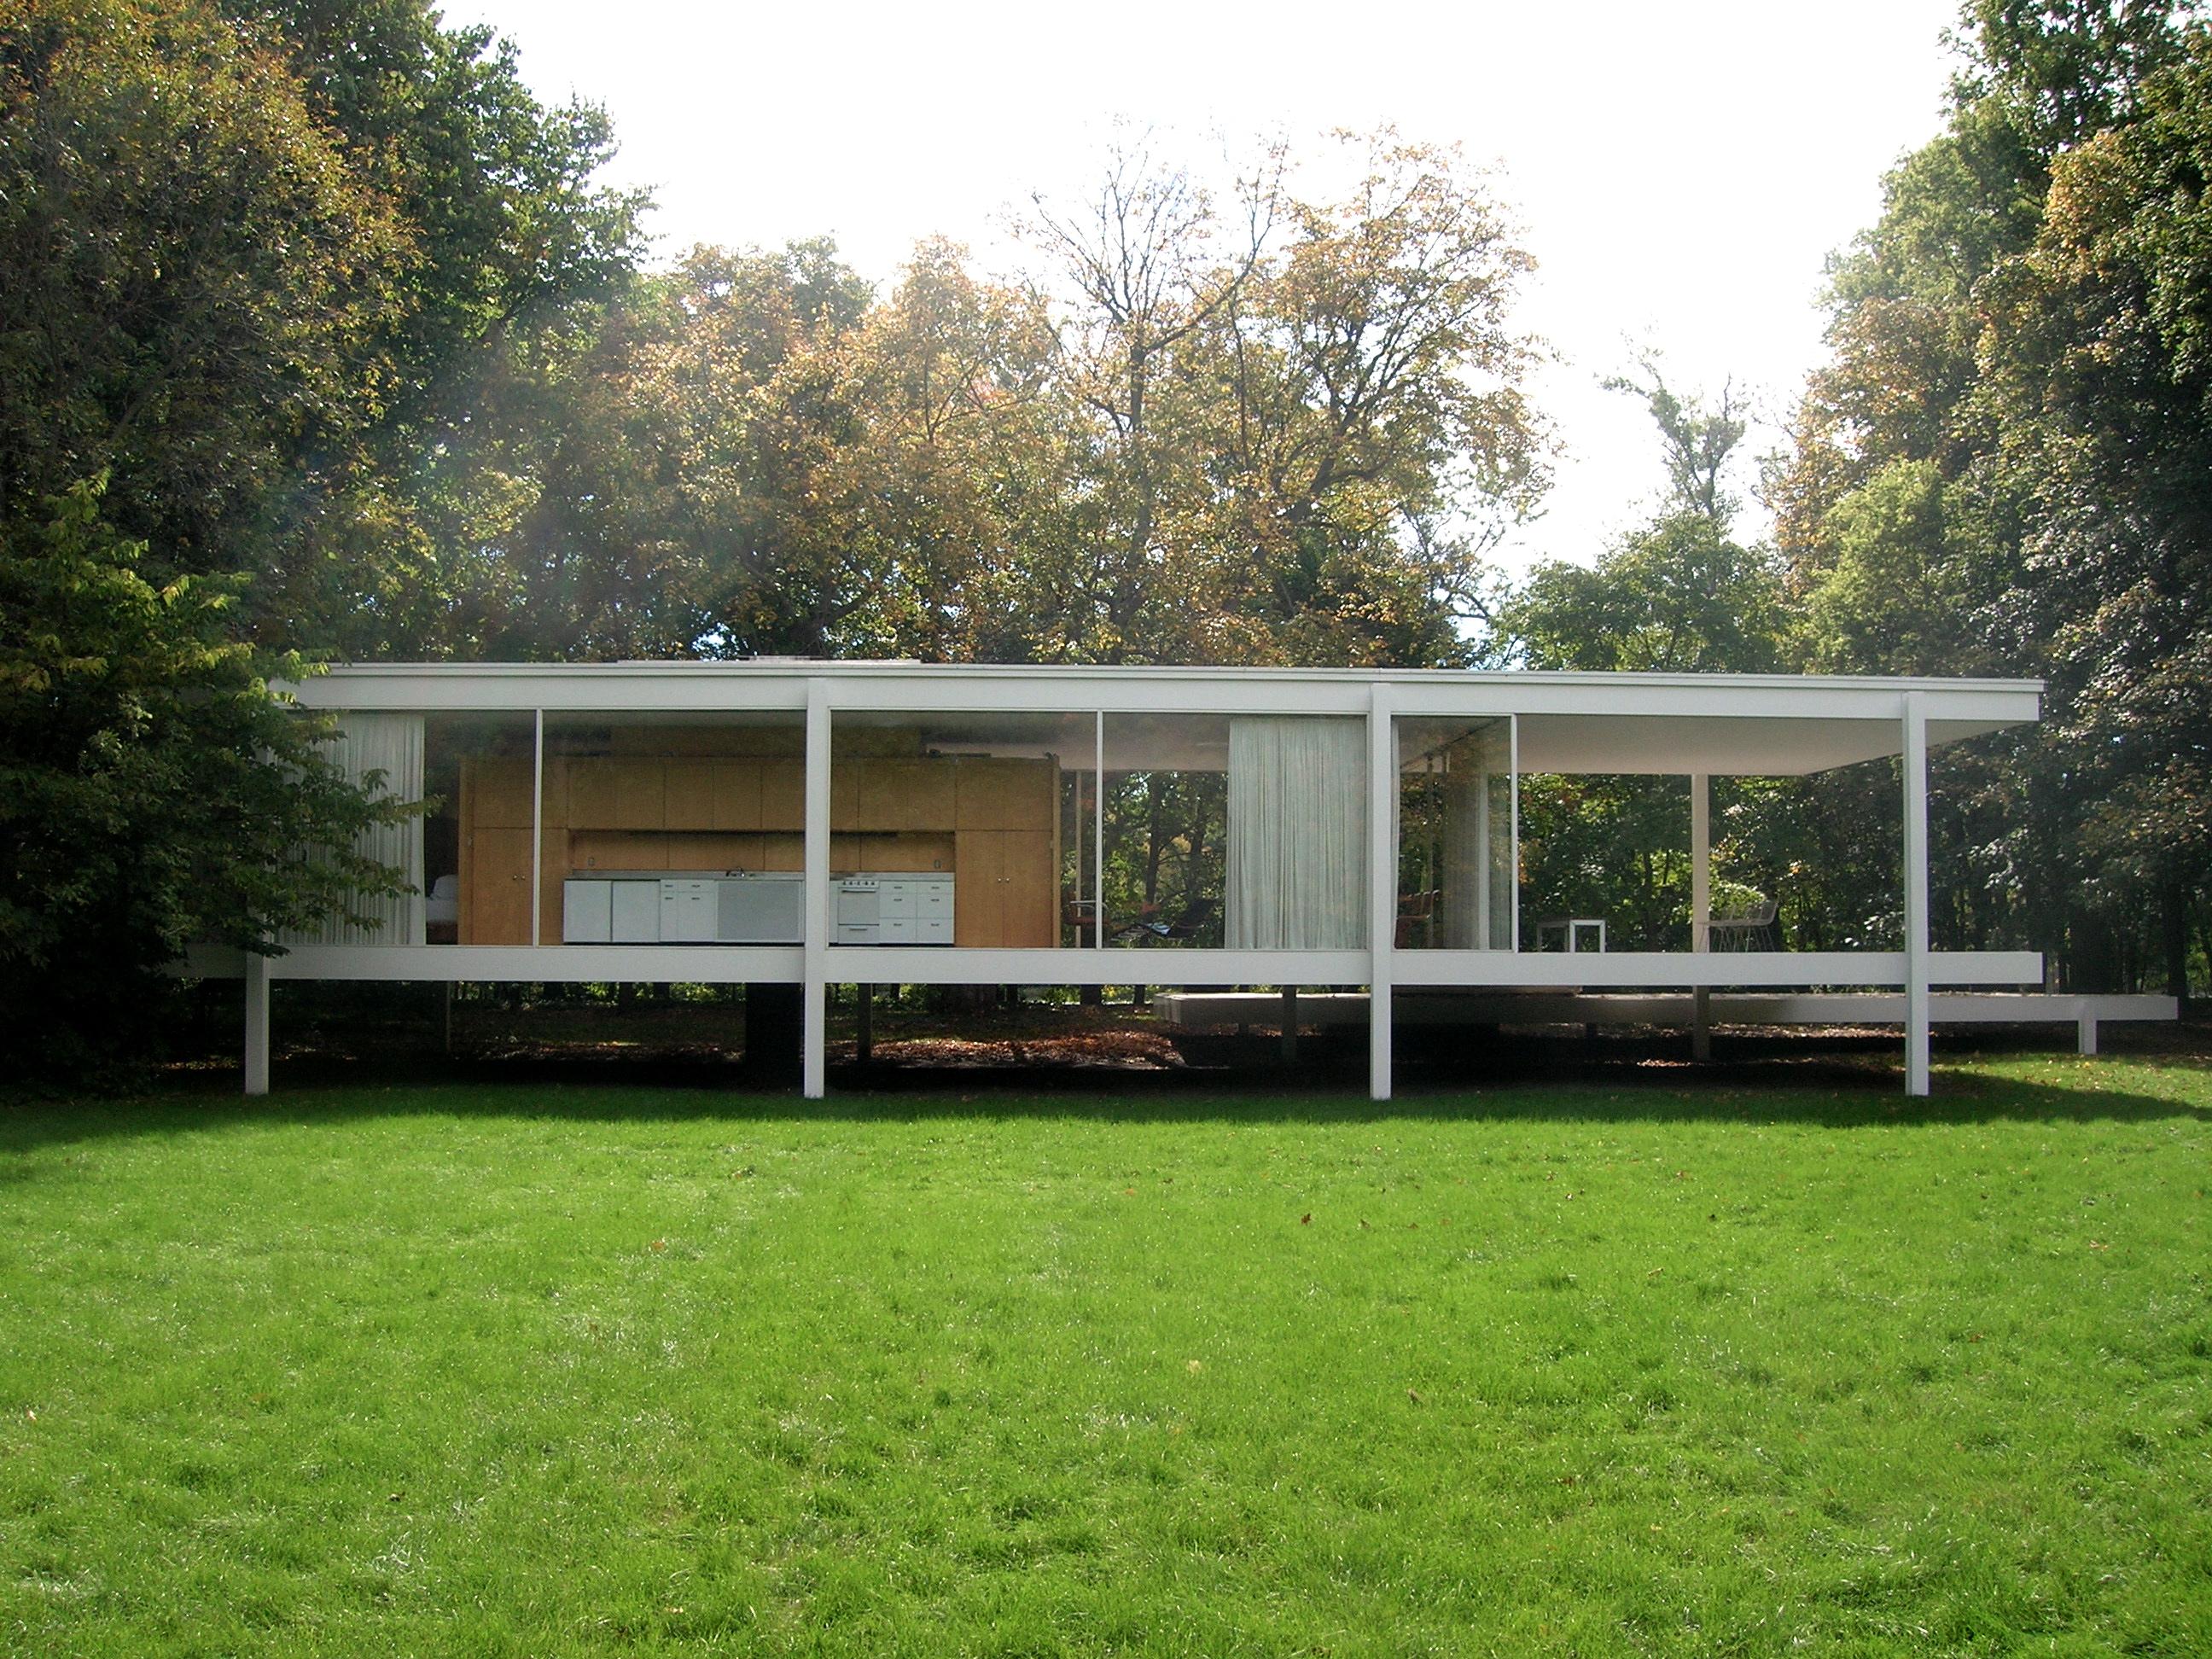 Farnsworth house plano illinois for The farnsworth